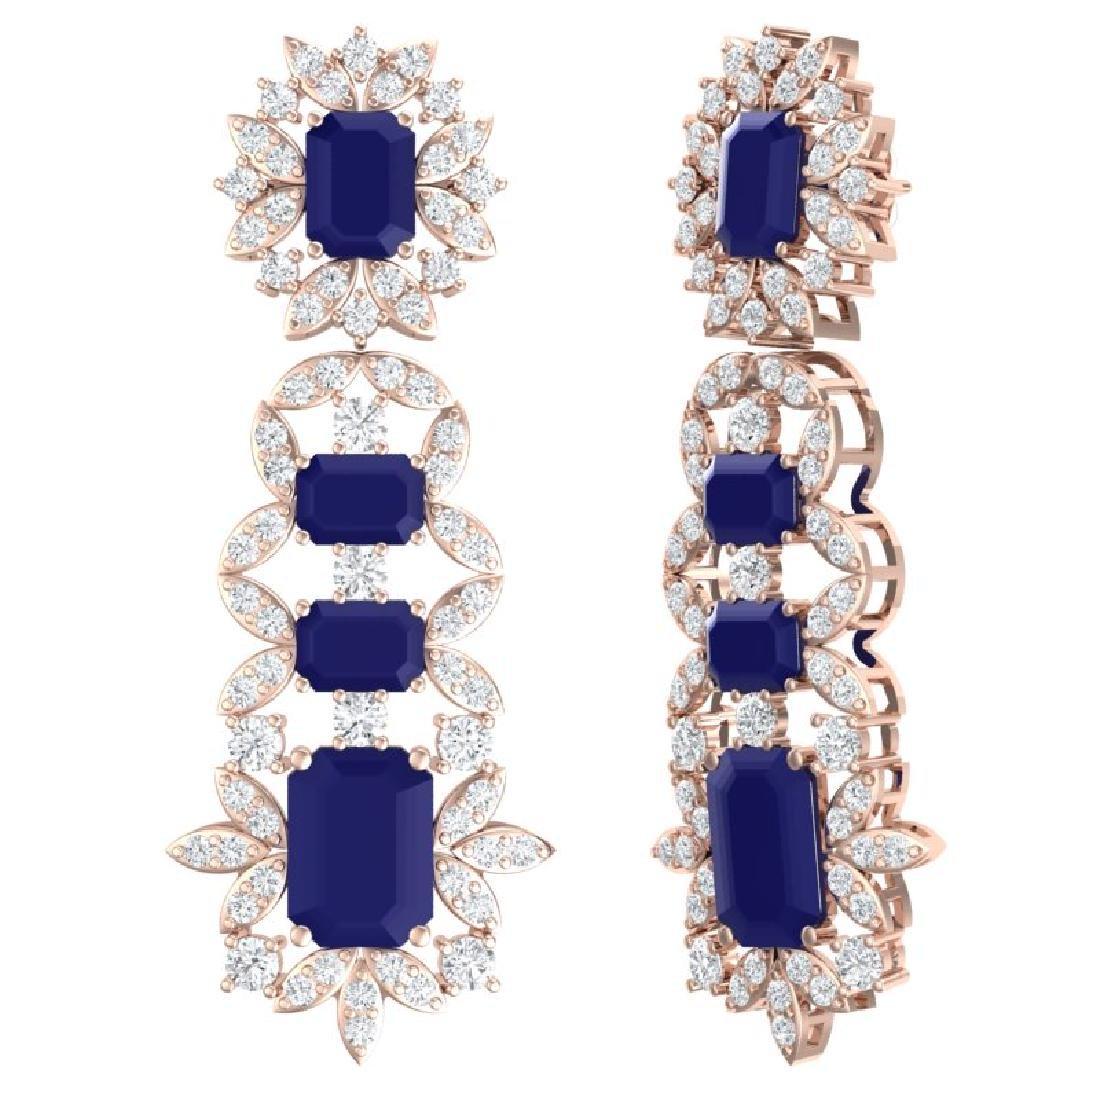 30.25 CTW Royalty Sapphire & VS Diamond Earrings 18K - 3